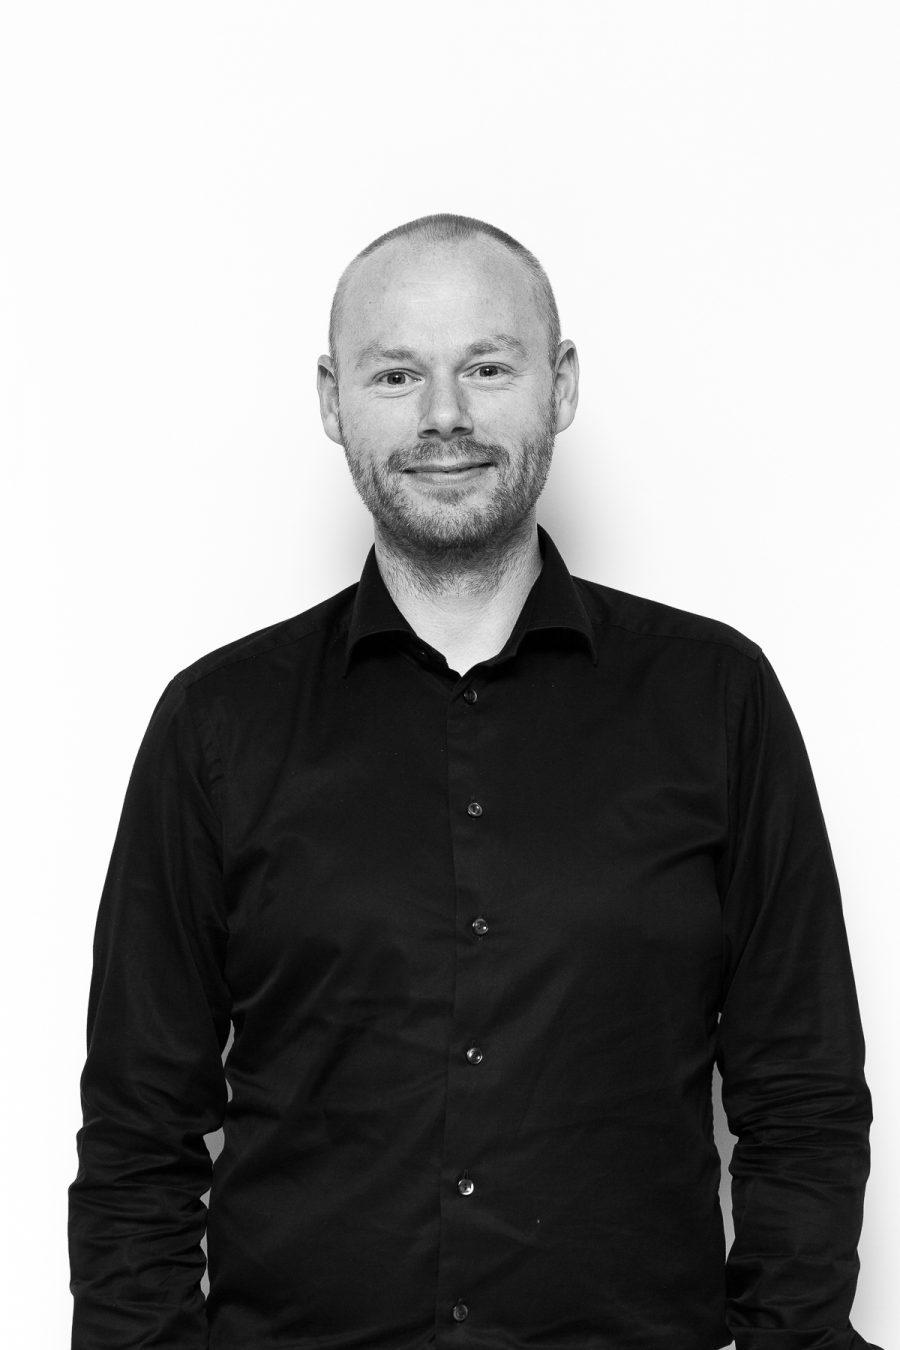 Stefan Schoonderbeek